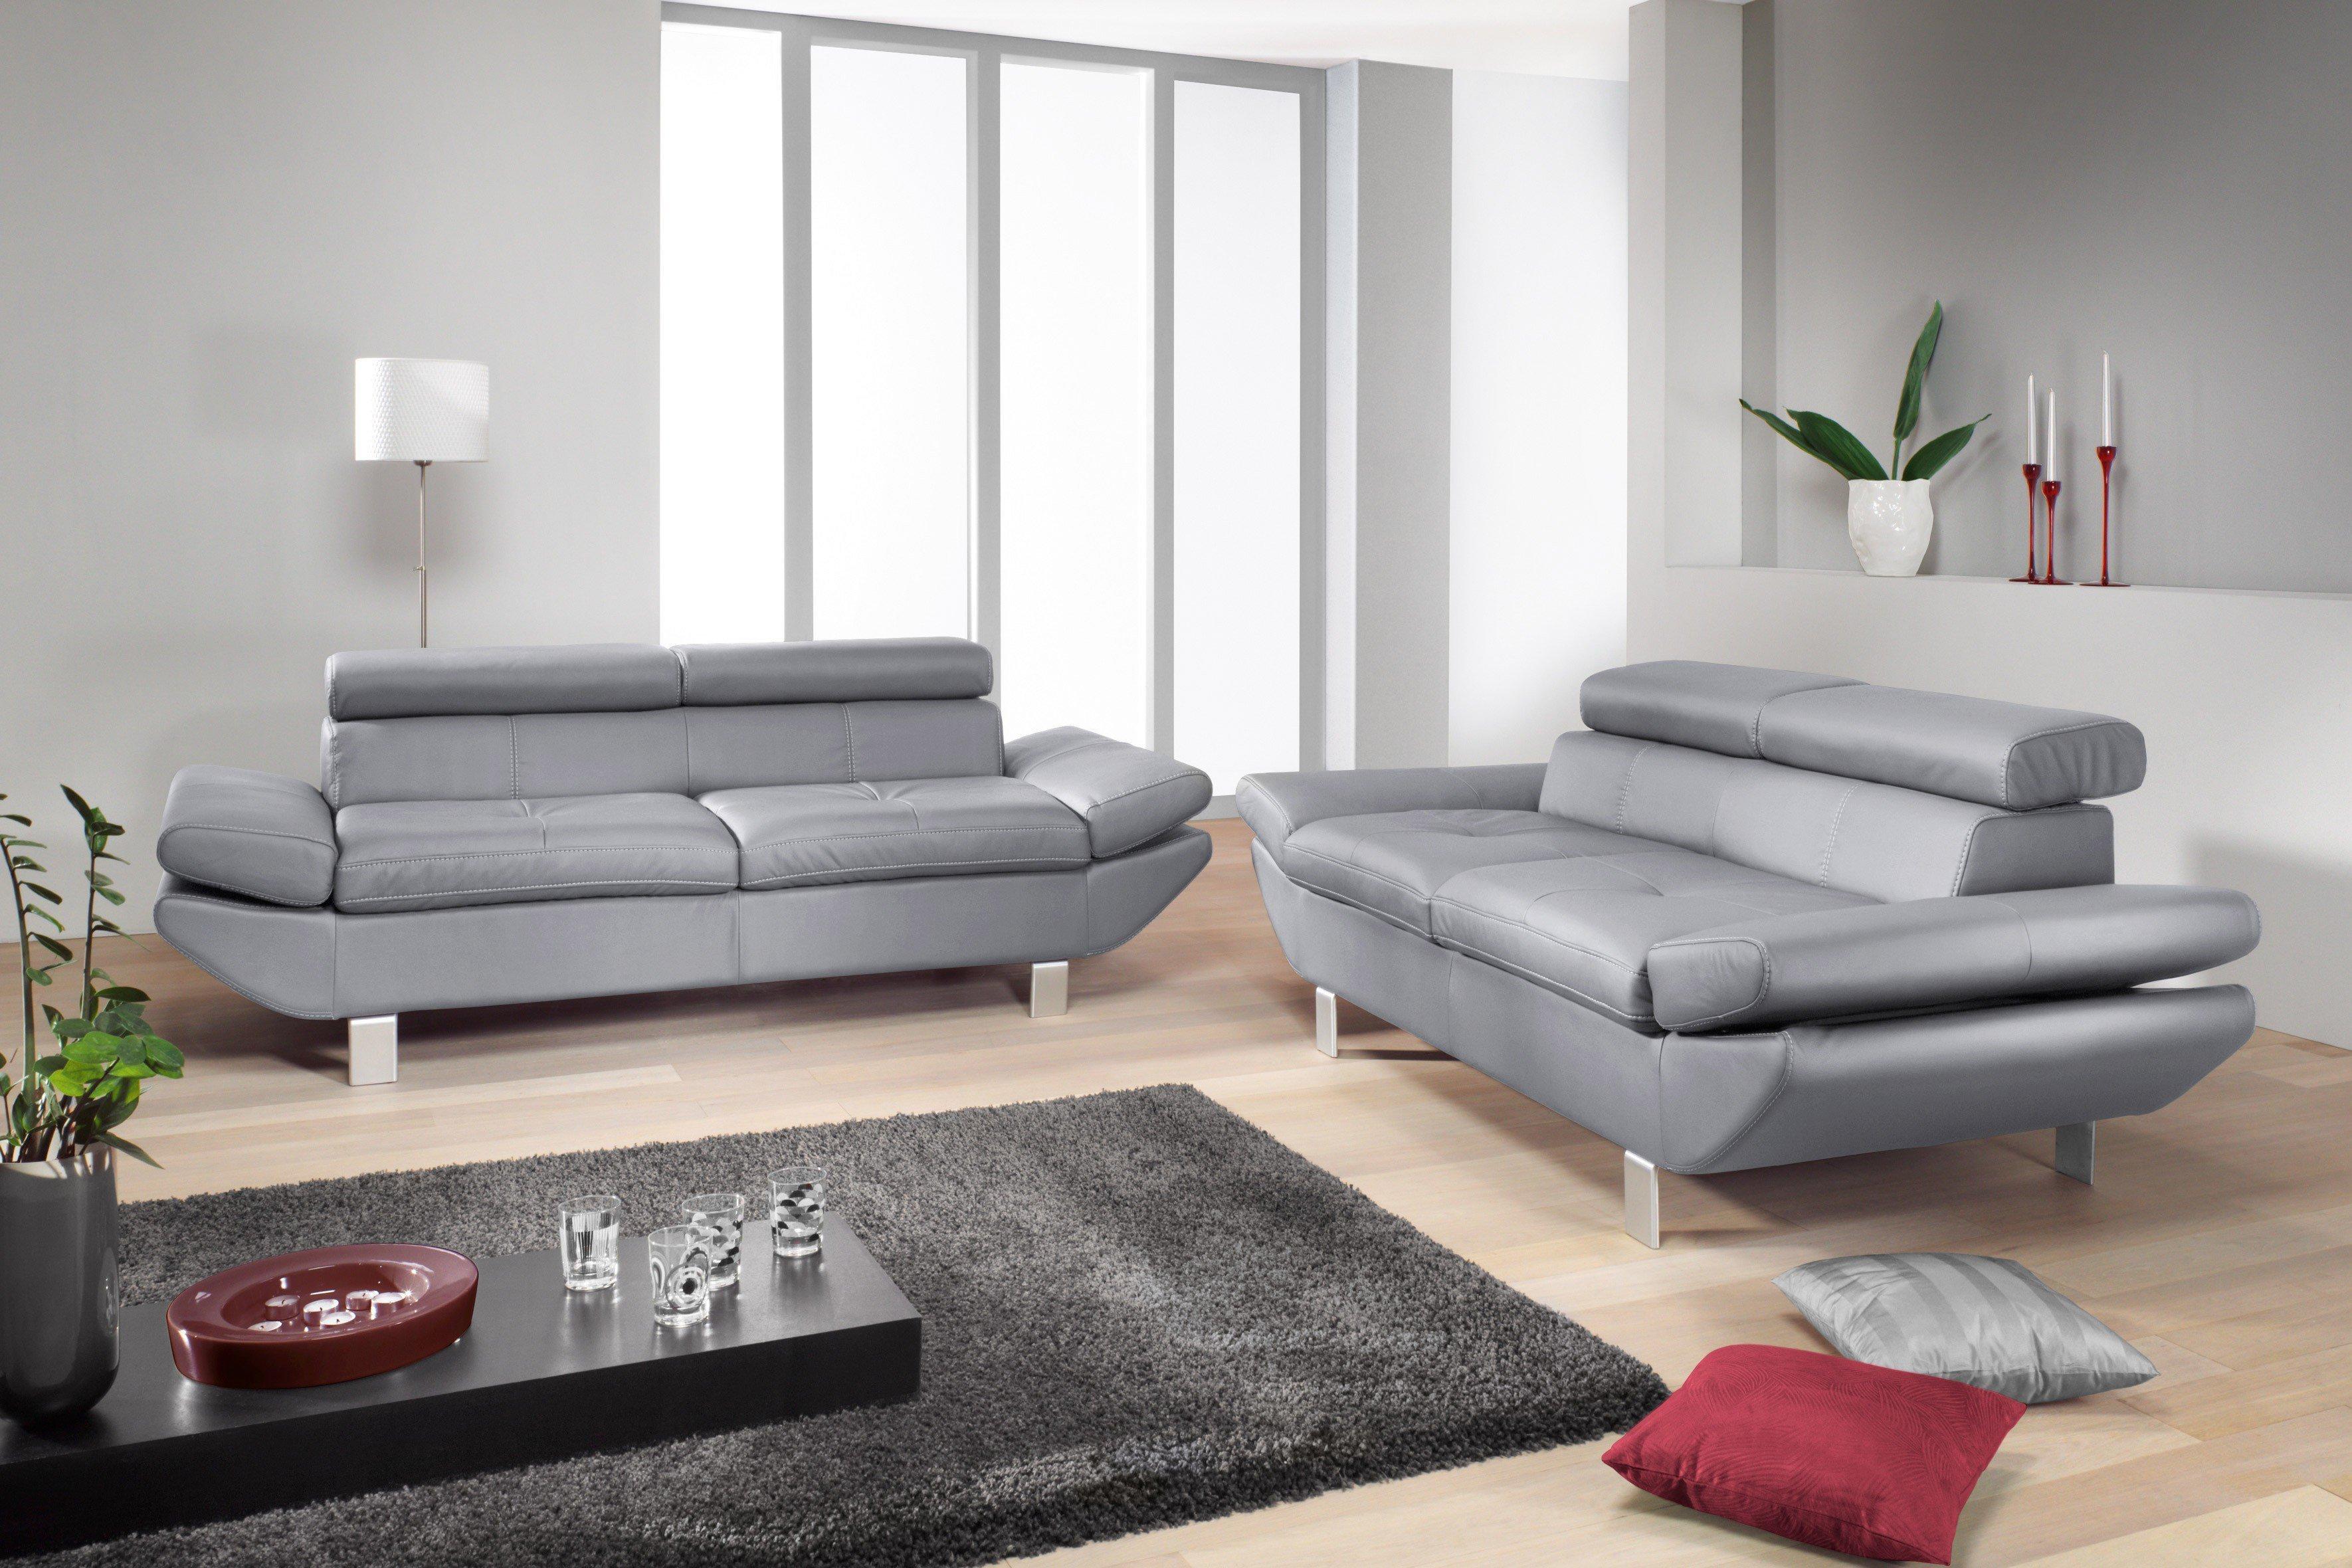 cotta carrier polstergarnitur grau m bel letz ihr online shop. Black Bedroom Furniture Sets. Home Design Ideas